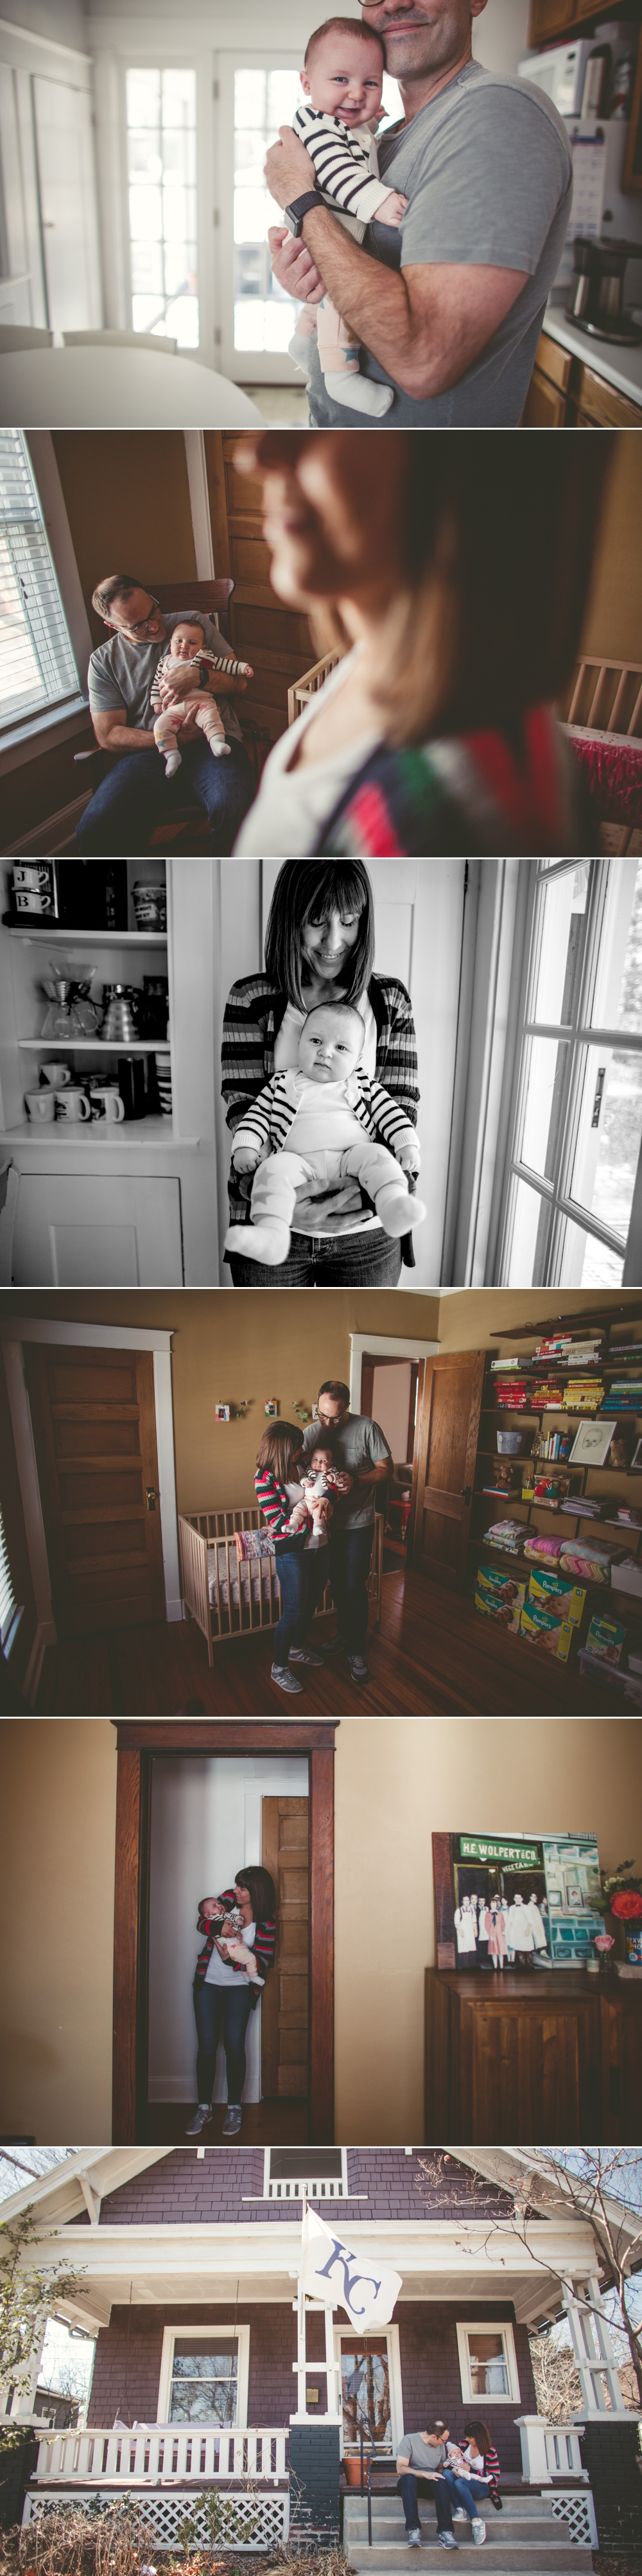 jason-domnigues-photography-kansas-city-family-portrait-photographer-lifestyle-portraits.jpg